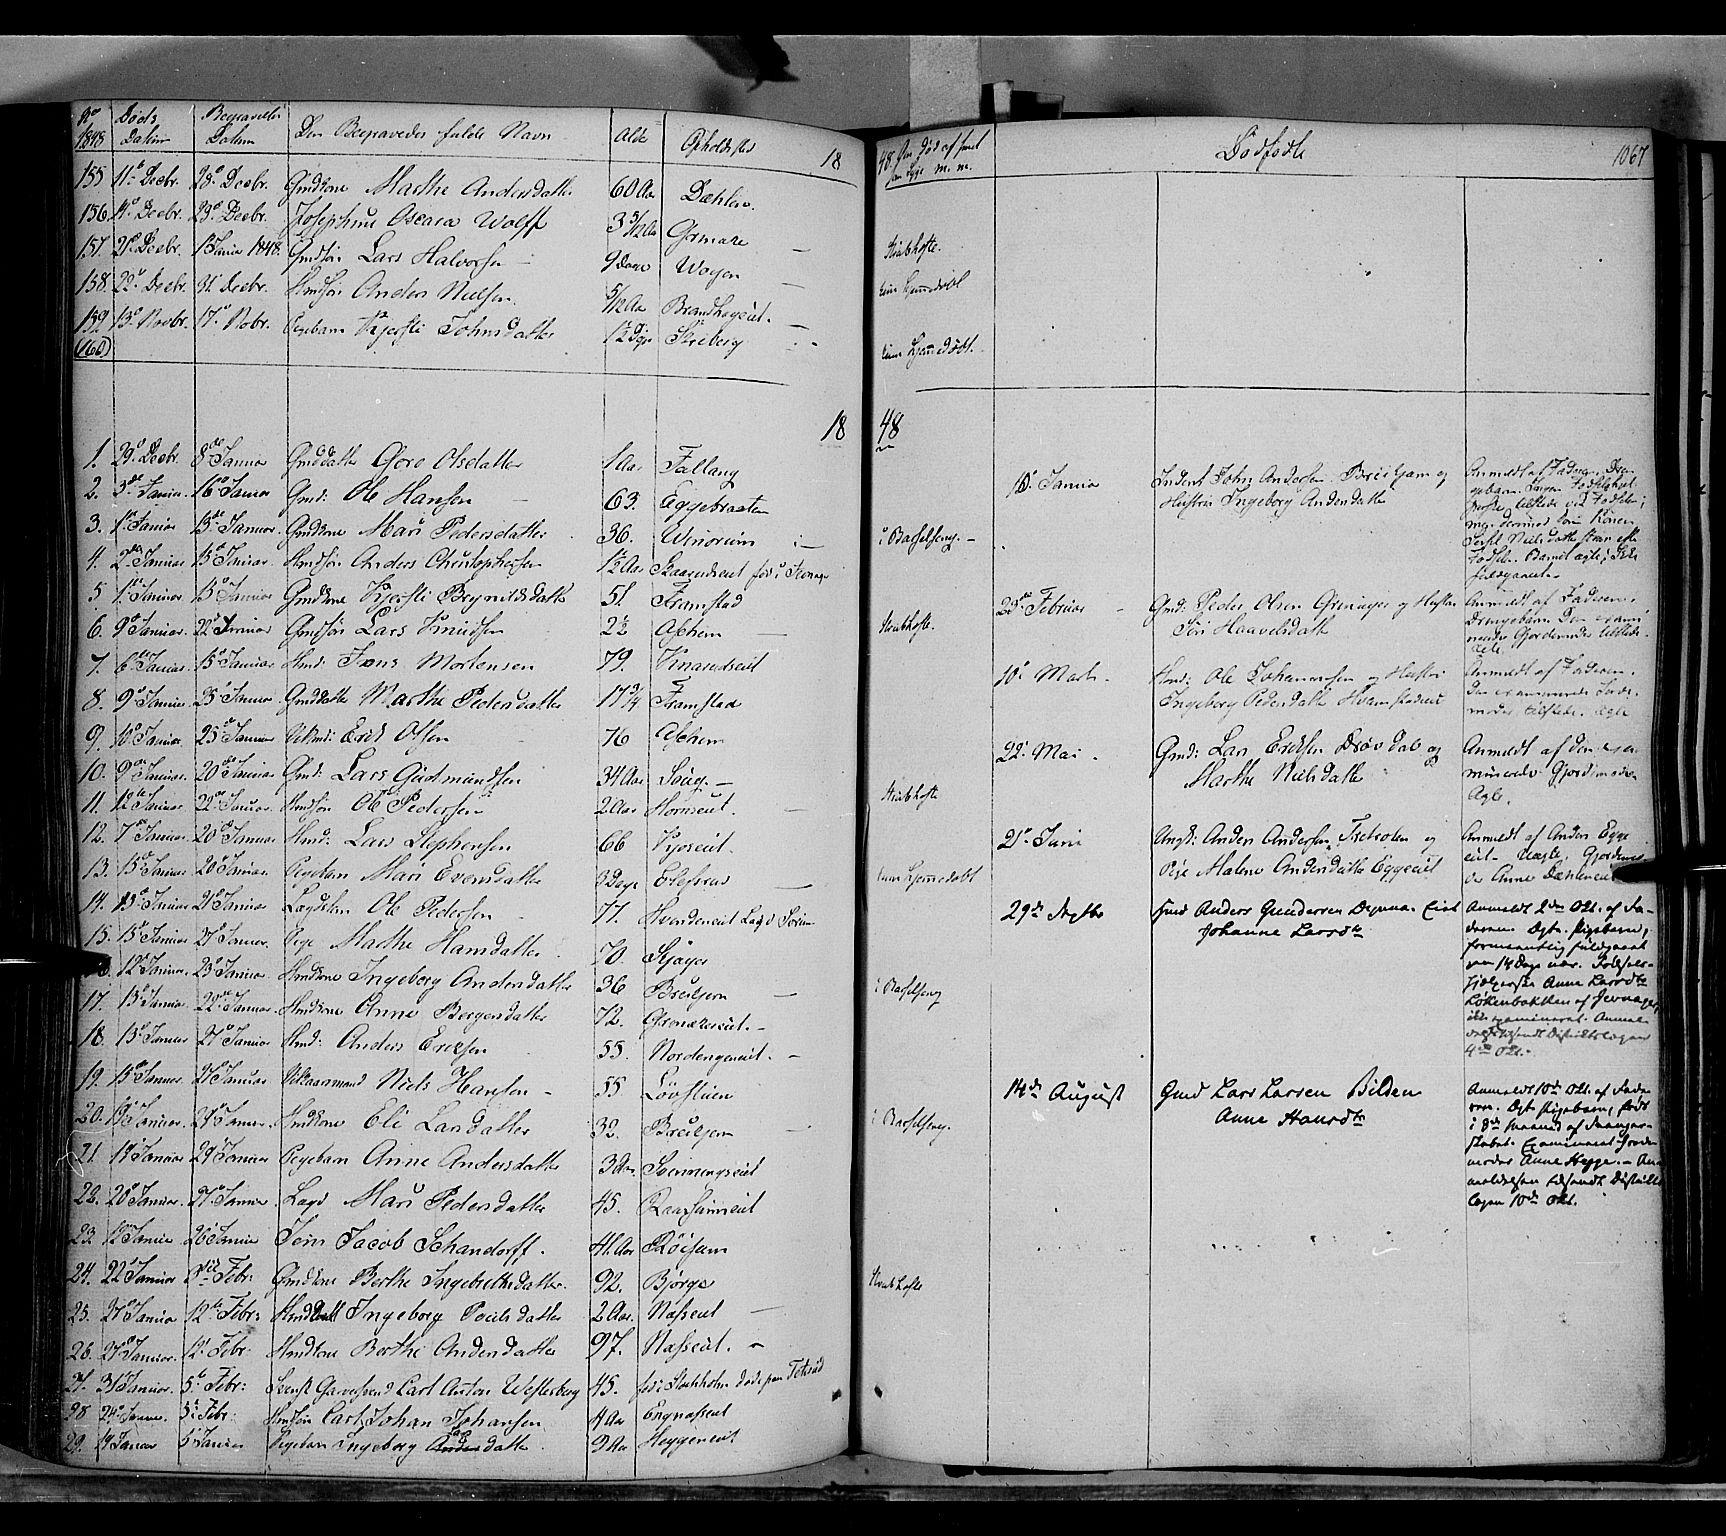 SAH, Gran prestekontor, Ministerialbok nr. 11, 1842-1856, s. 1066-1067